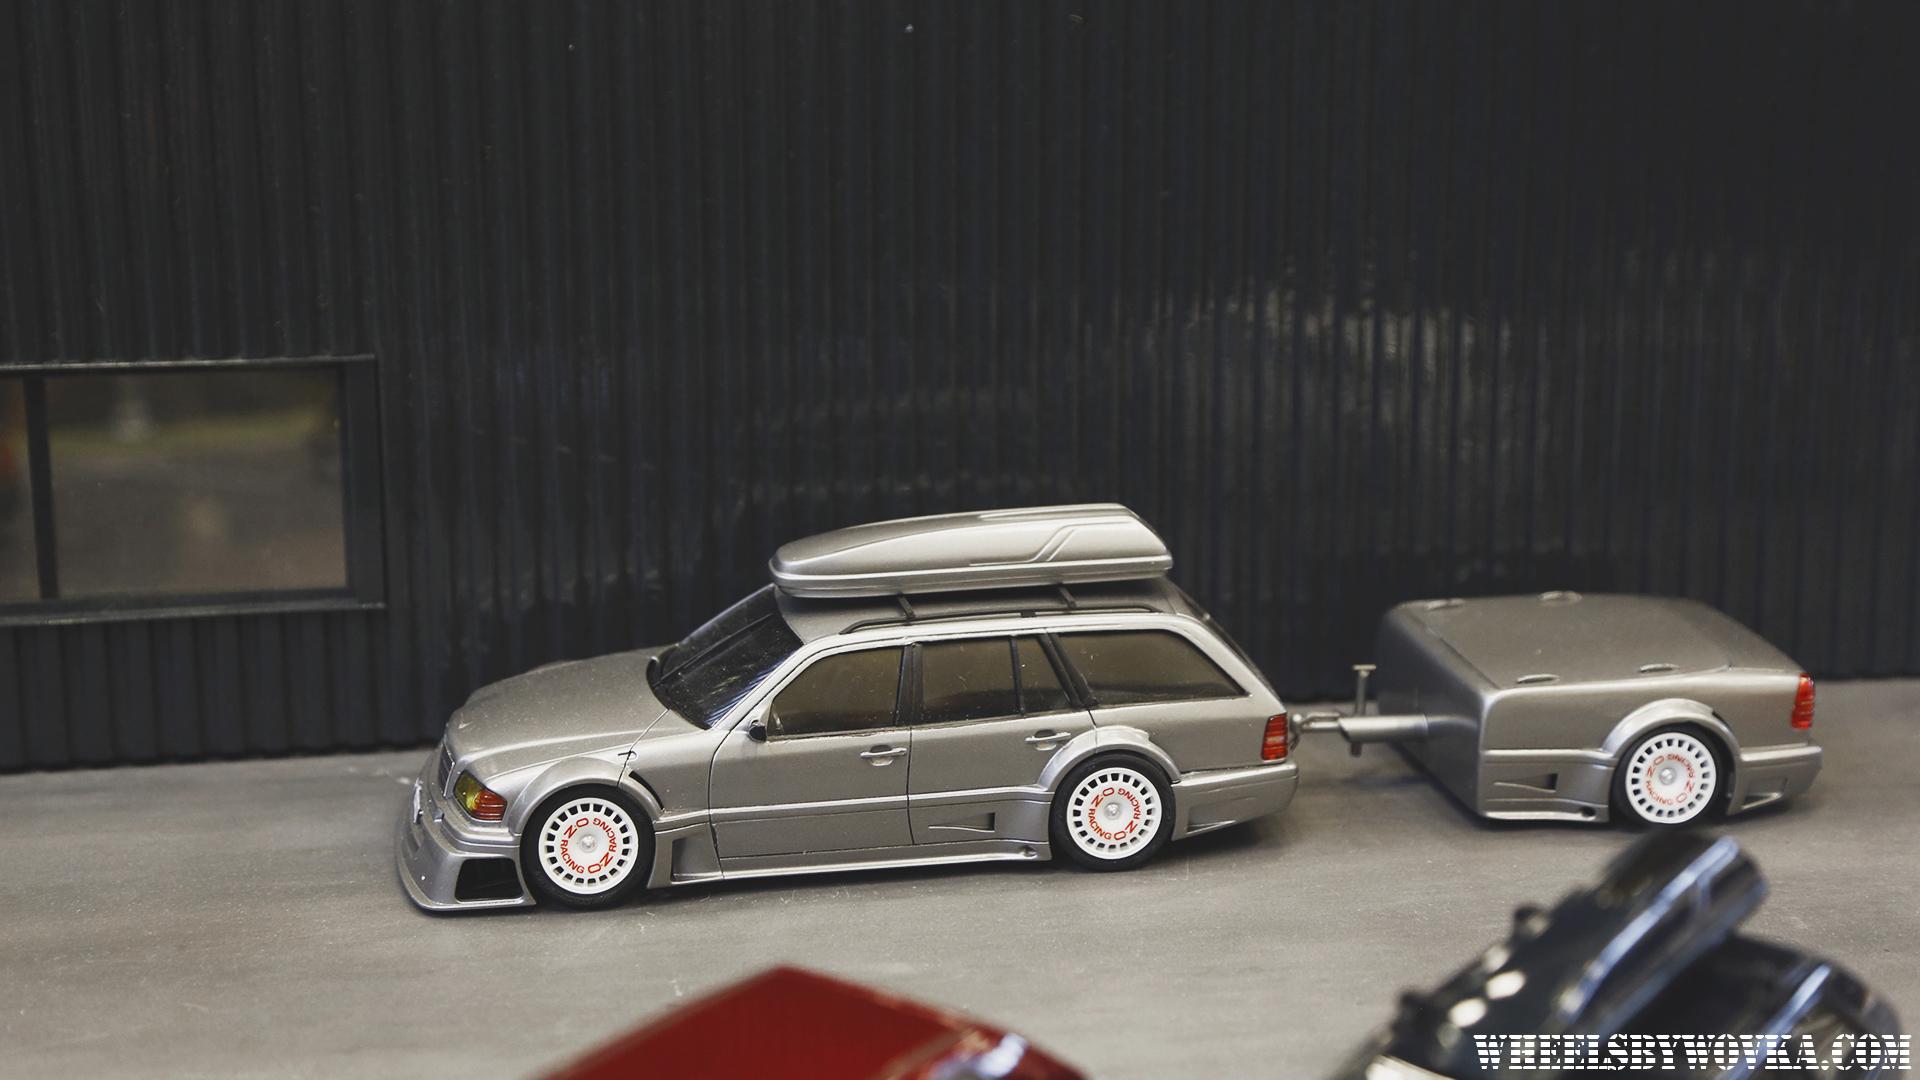 model-car-show-frankfurt-2017-44